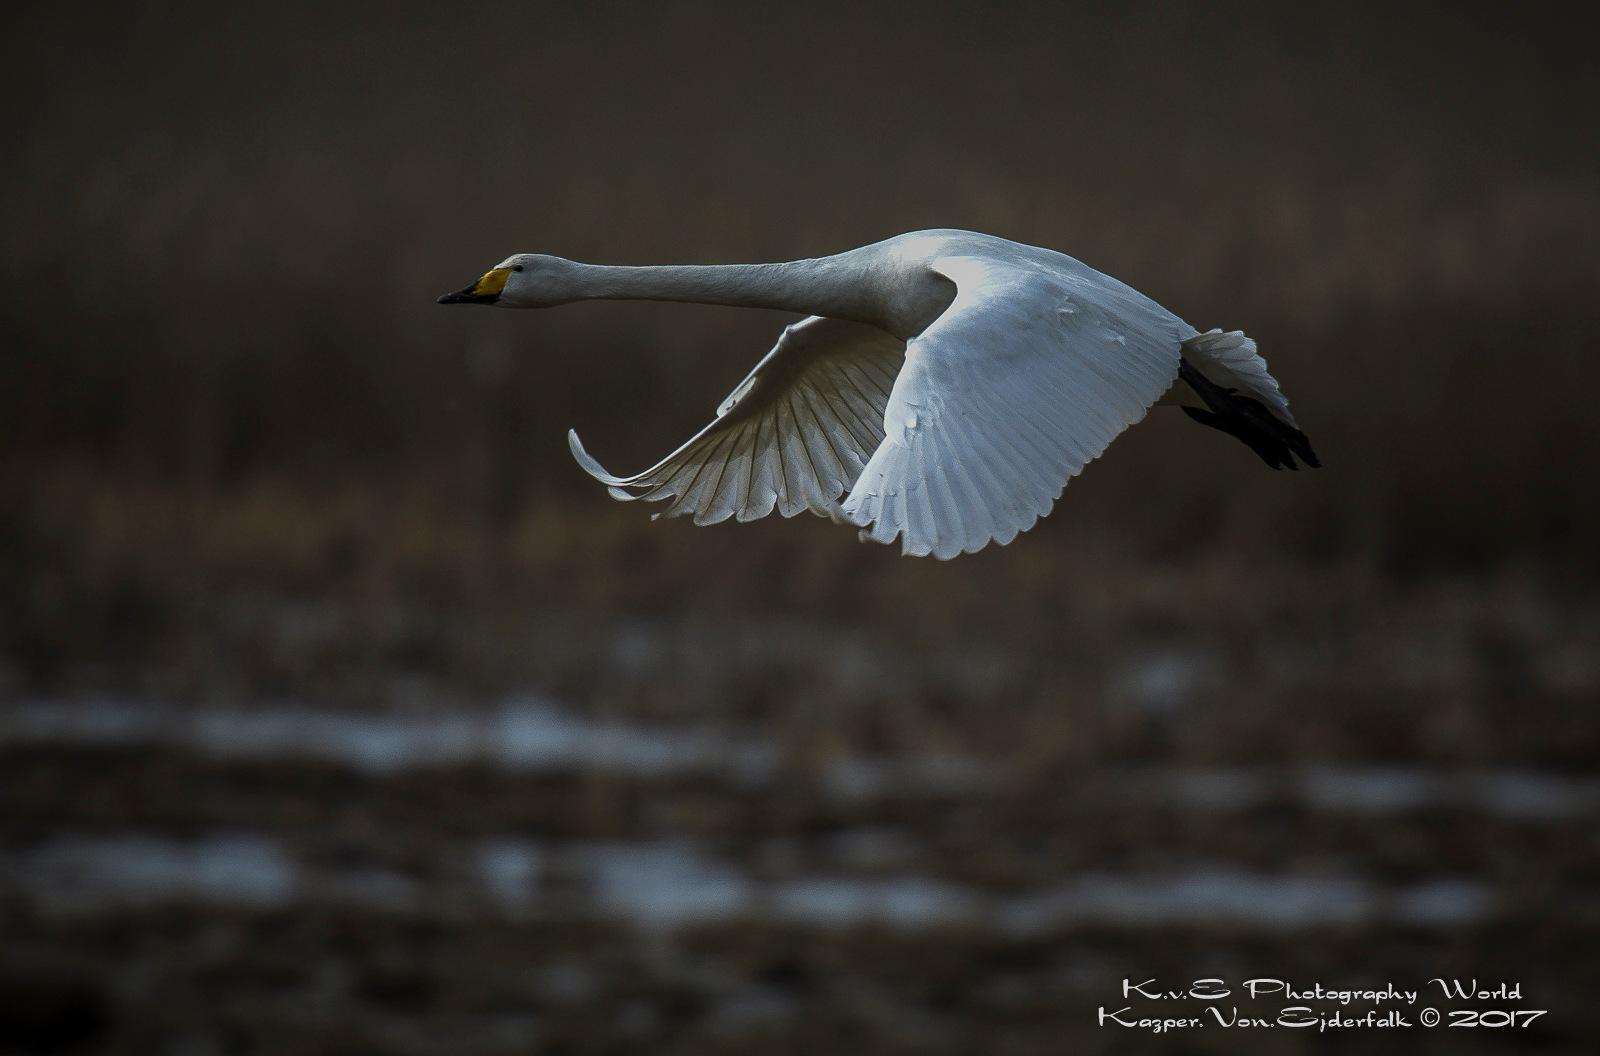 Early Morning Swan by Von Ejderfalk Kazper